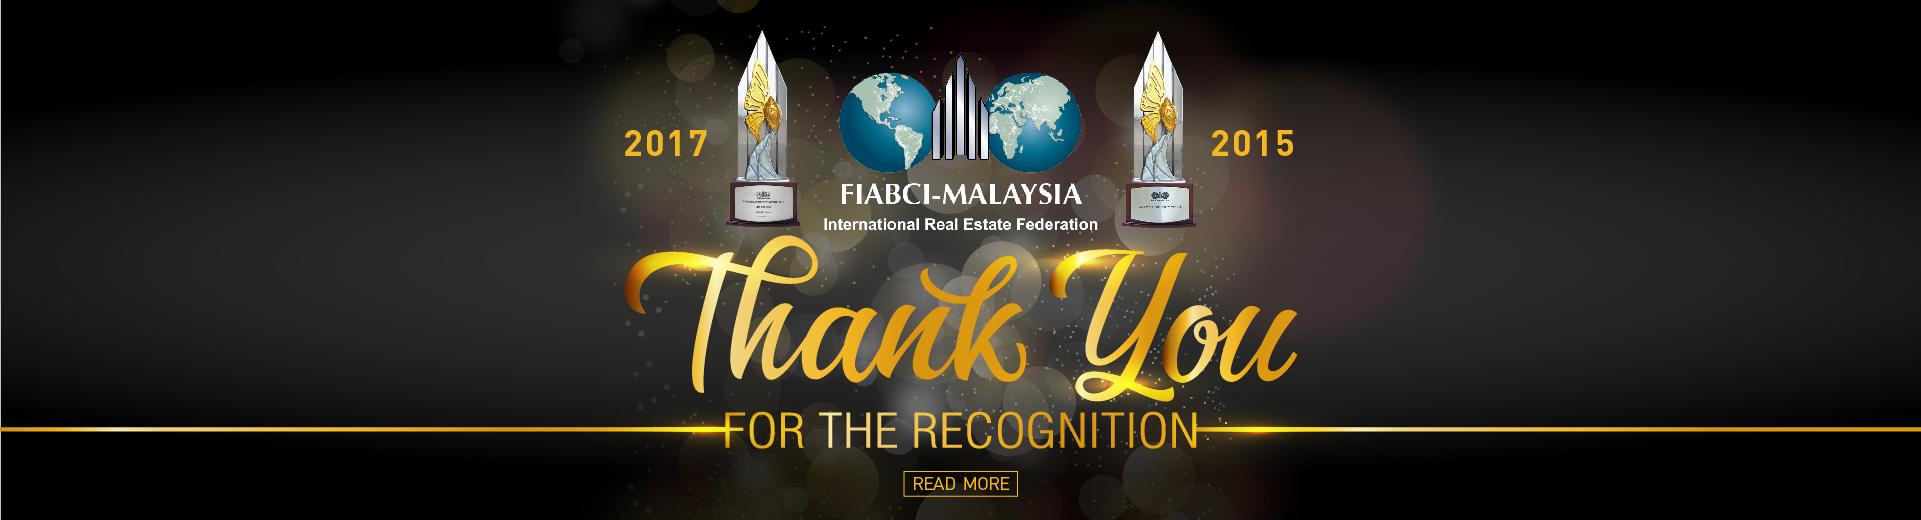 R-EXSIM_Fiabci-Award-Web-Banner_FA